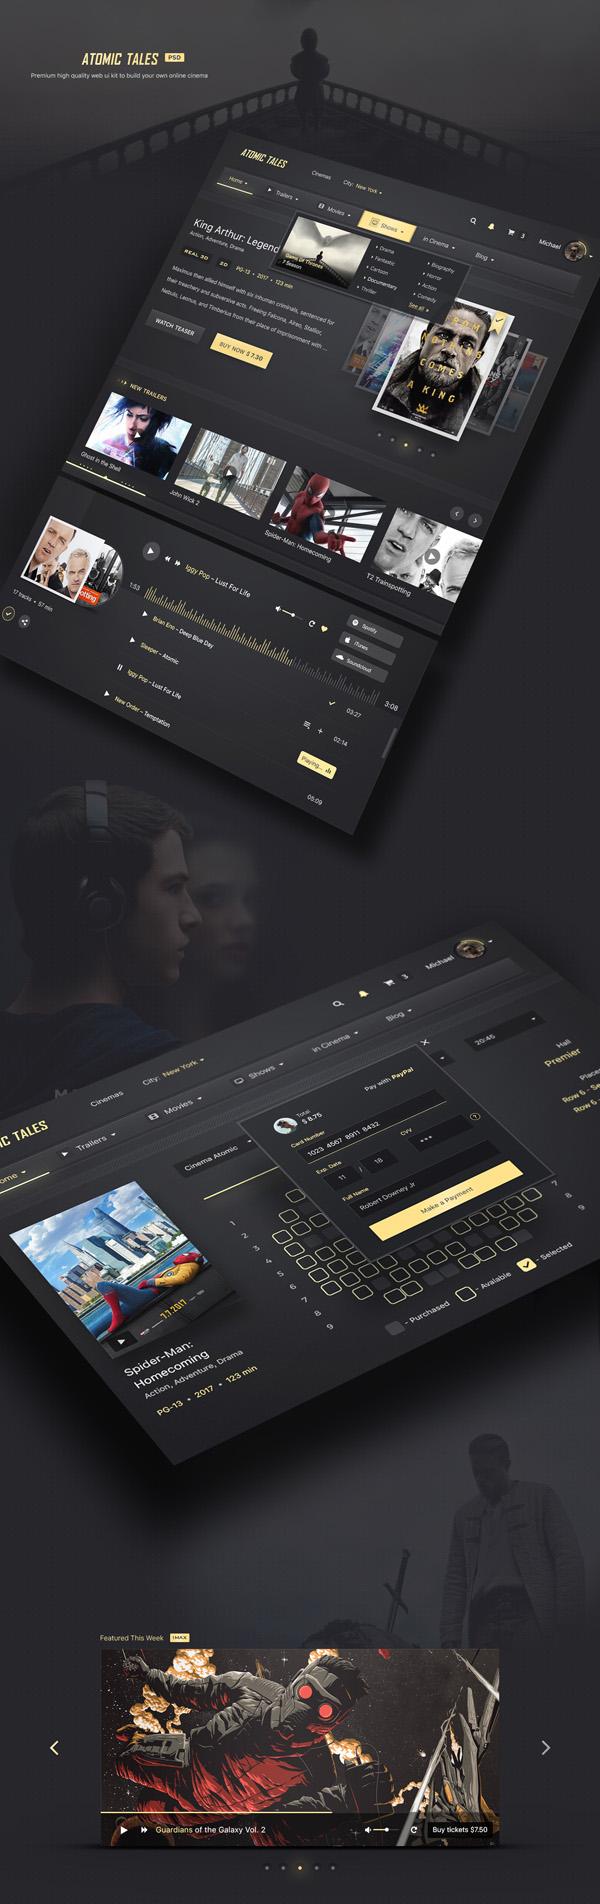 Atomic Tales Web PSD UI Kit